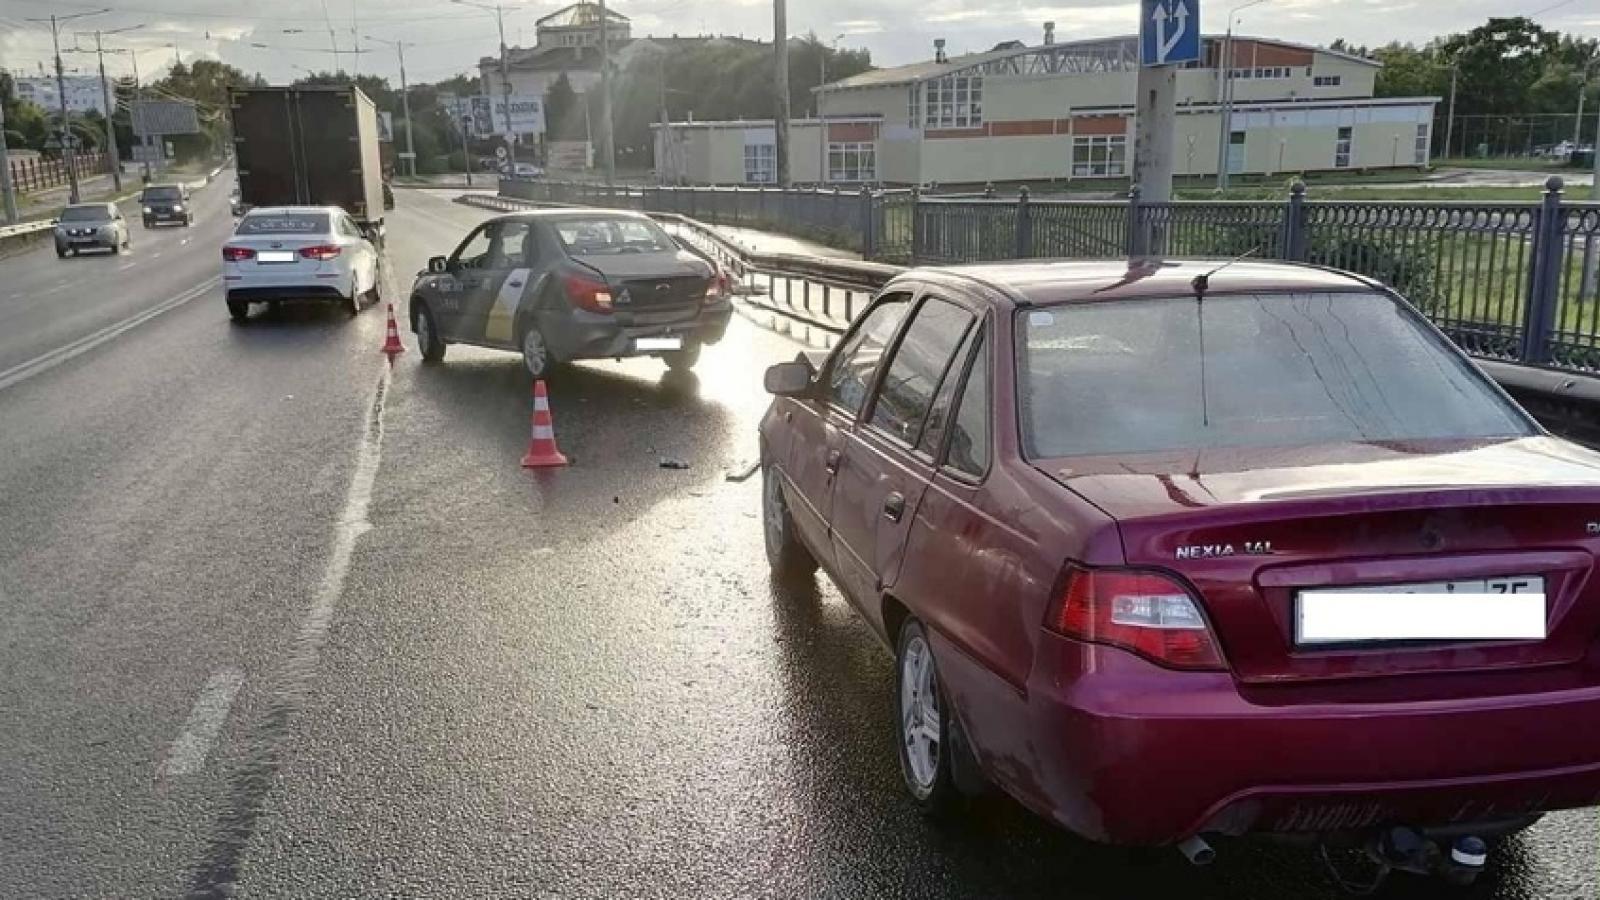 При столкновении машин пострадал пешеход